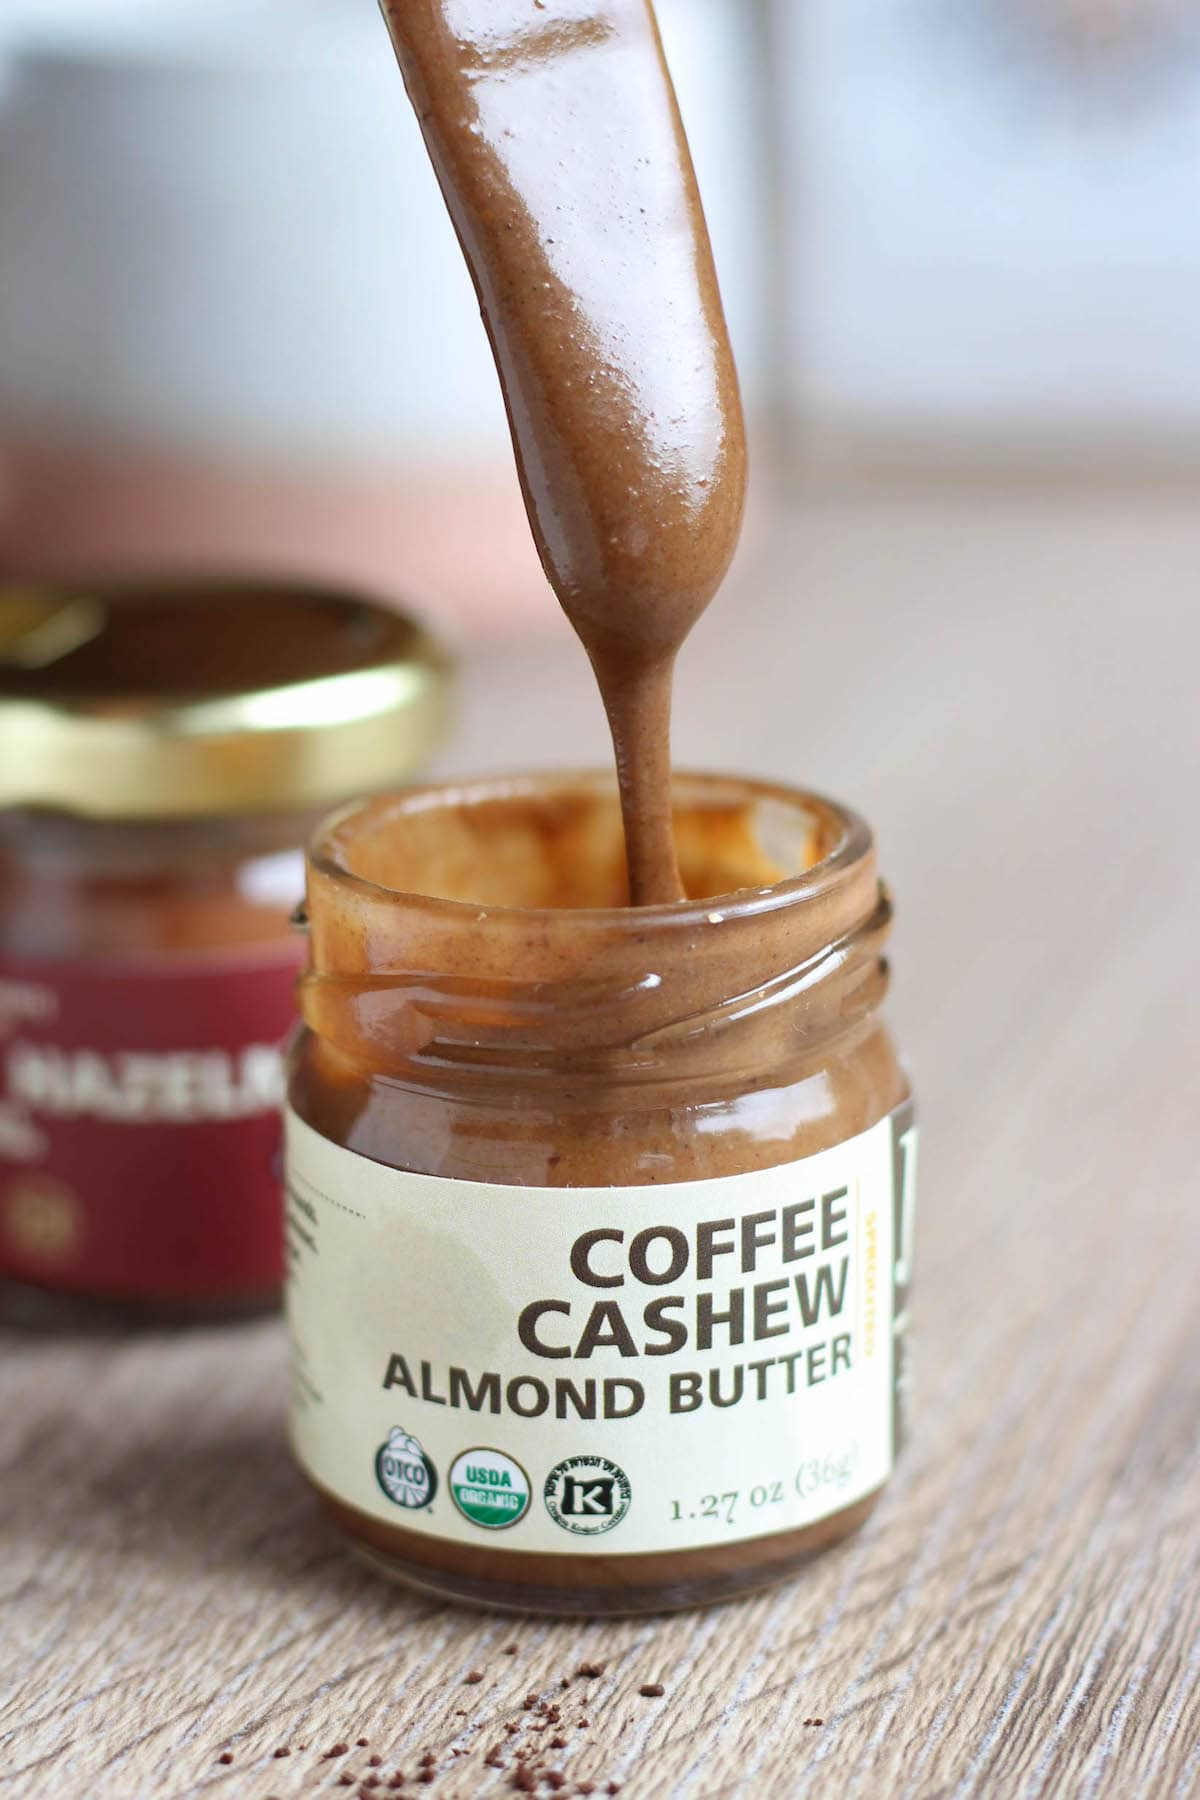 Drippy jem organics coffee cashew almond butter that I put in my vegan bulletproof coffee